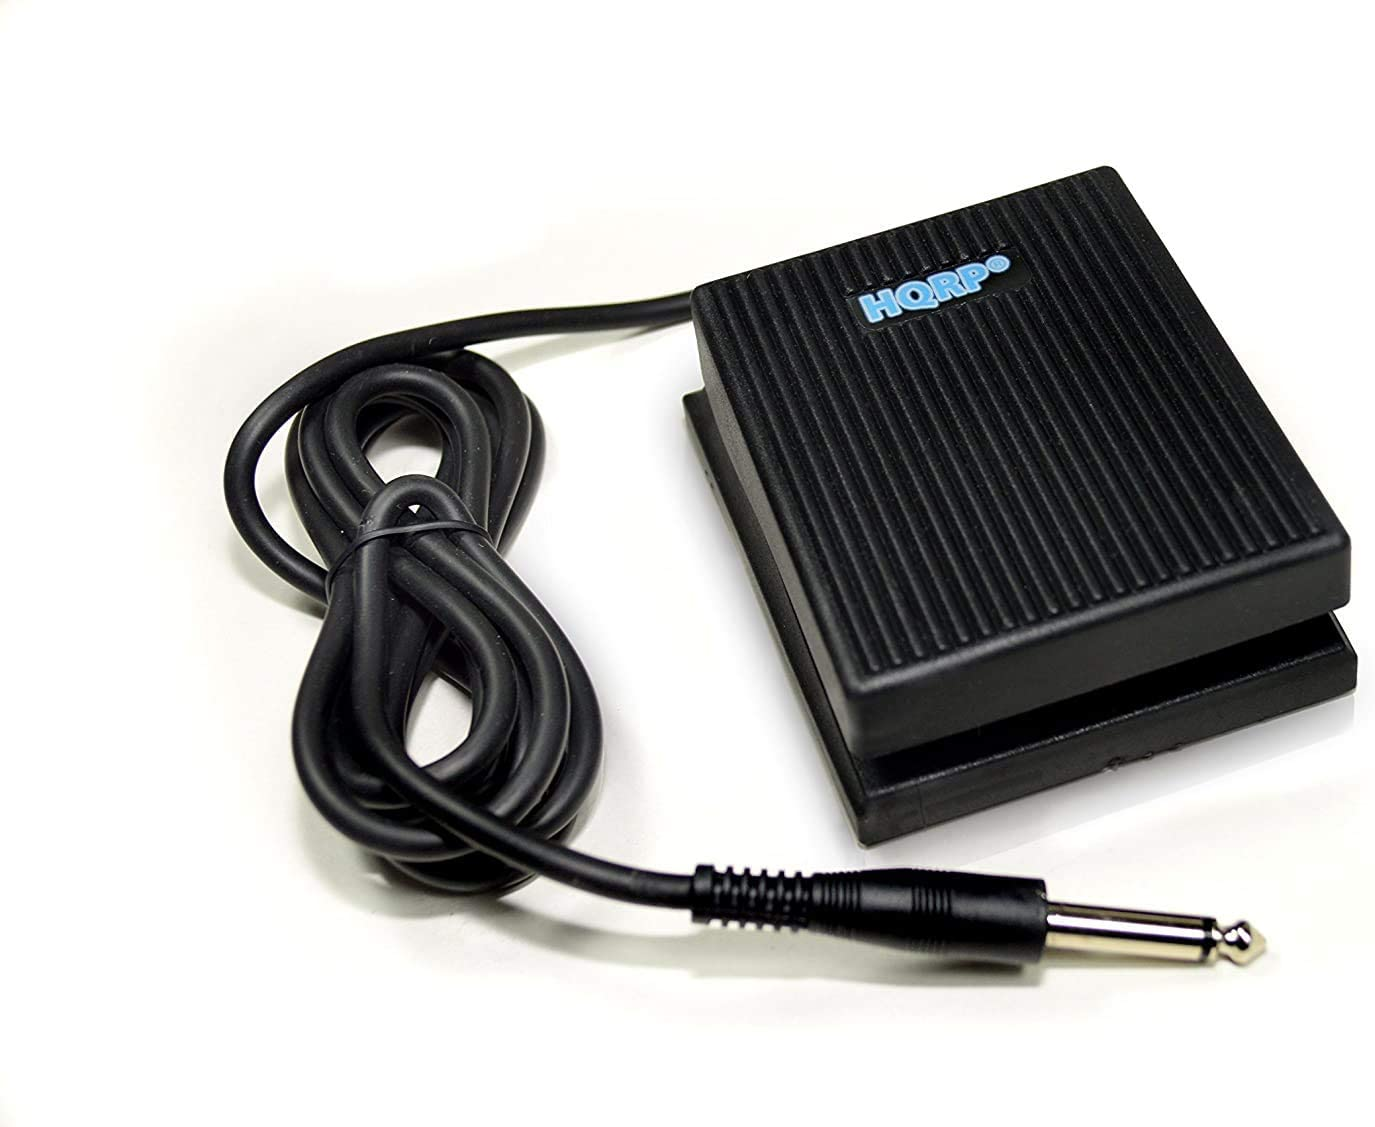 HQRP Pedal universal de sustain tipo interruptor de pie para Yamaha/Casio/Roland/M-Audio/Korg/Kurzweil. Teclados digitales